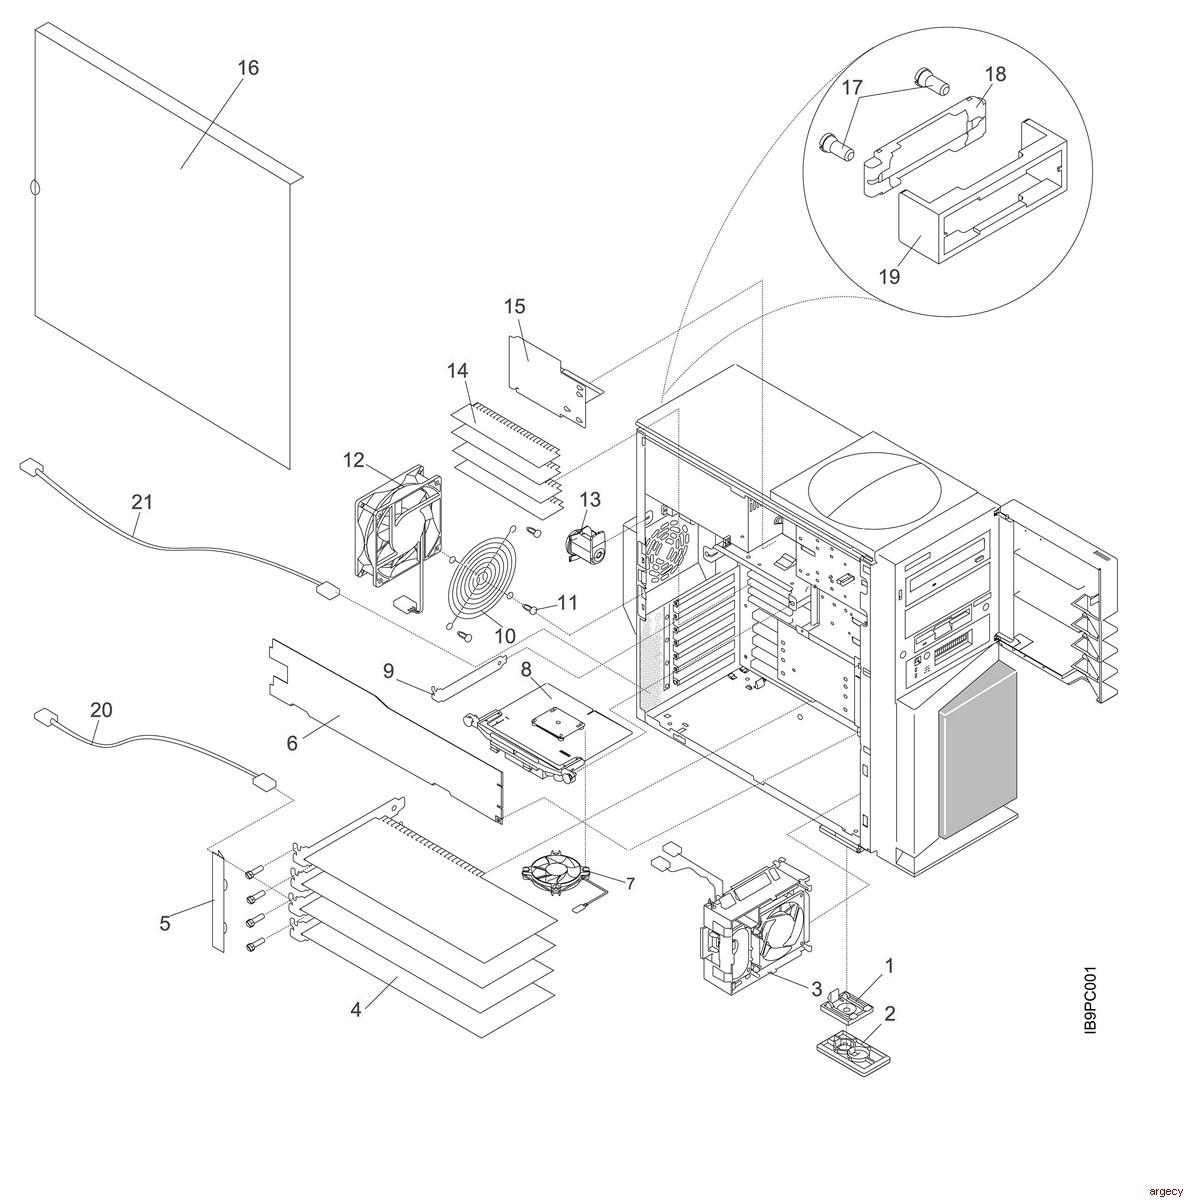 https://www.argecy.com/images/4000-parts-3411.jpg